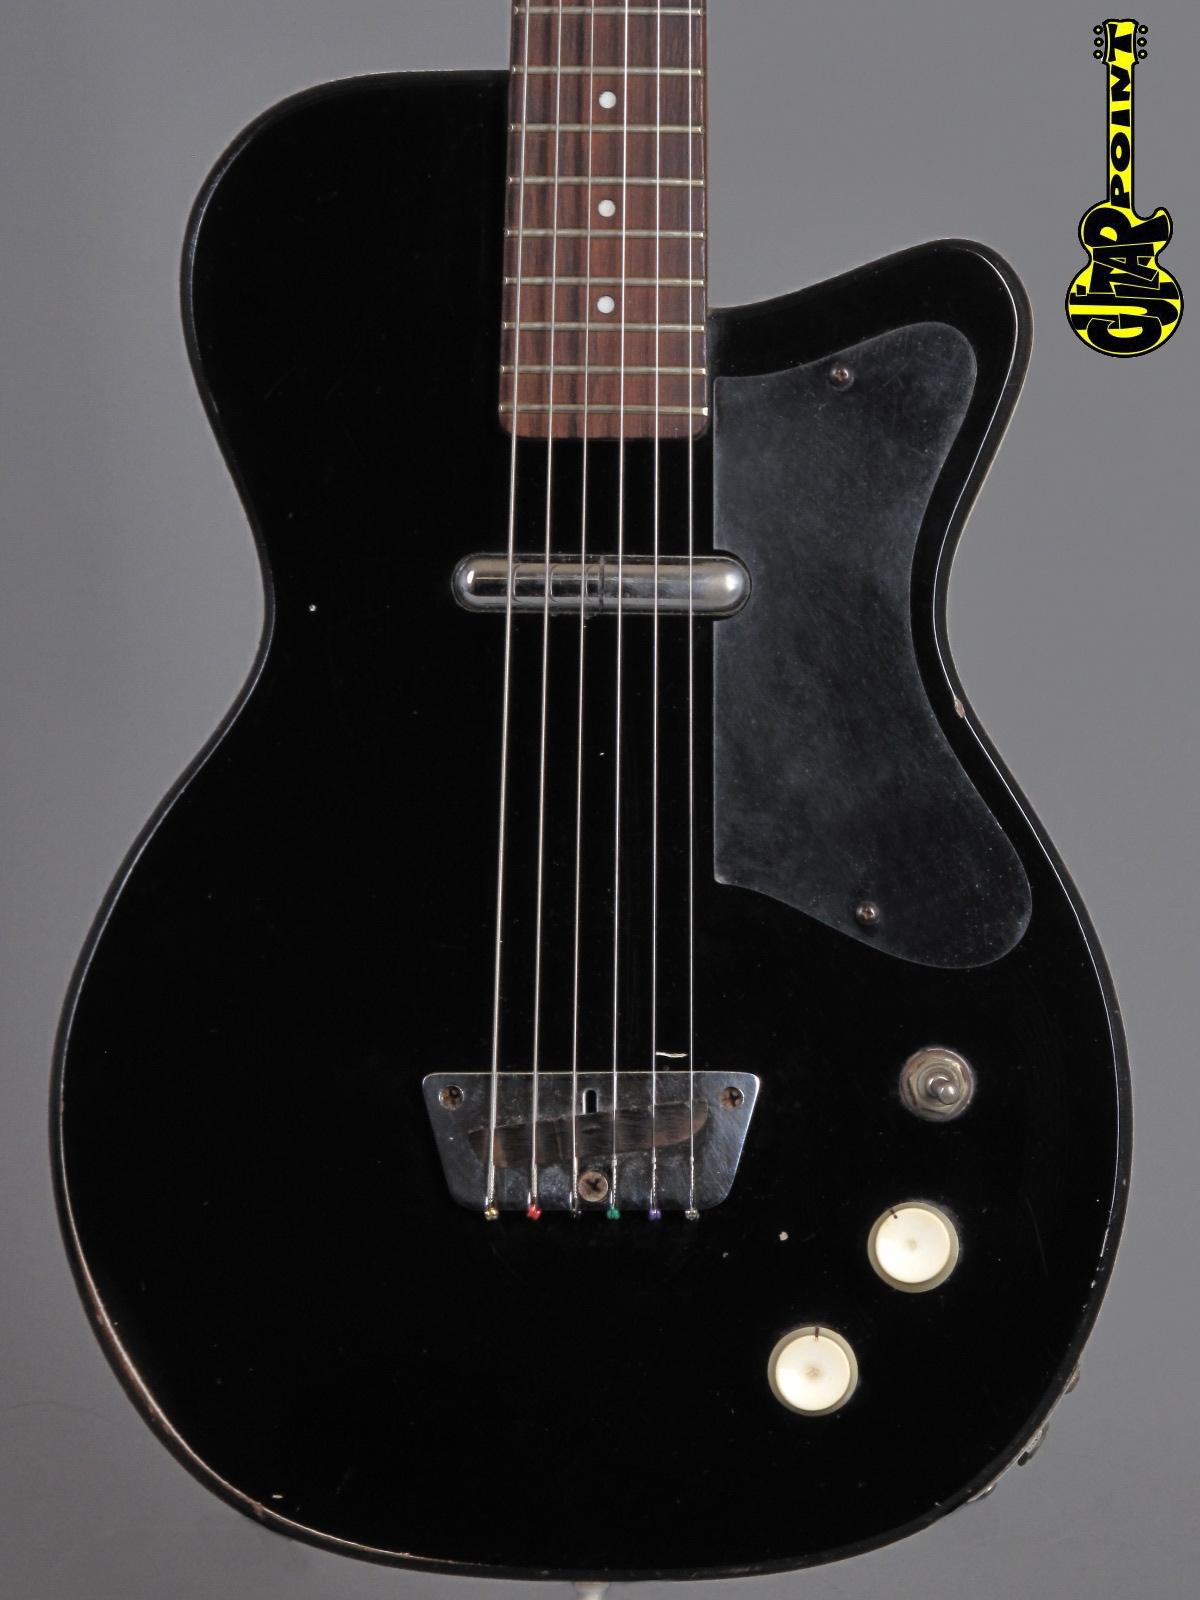 1957 Silvertone U1 Model 1317 - Black